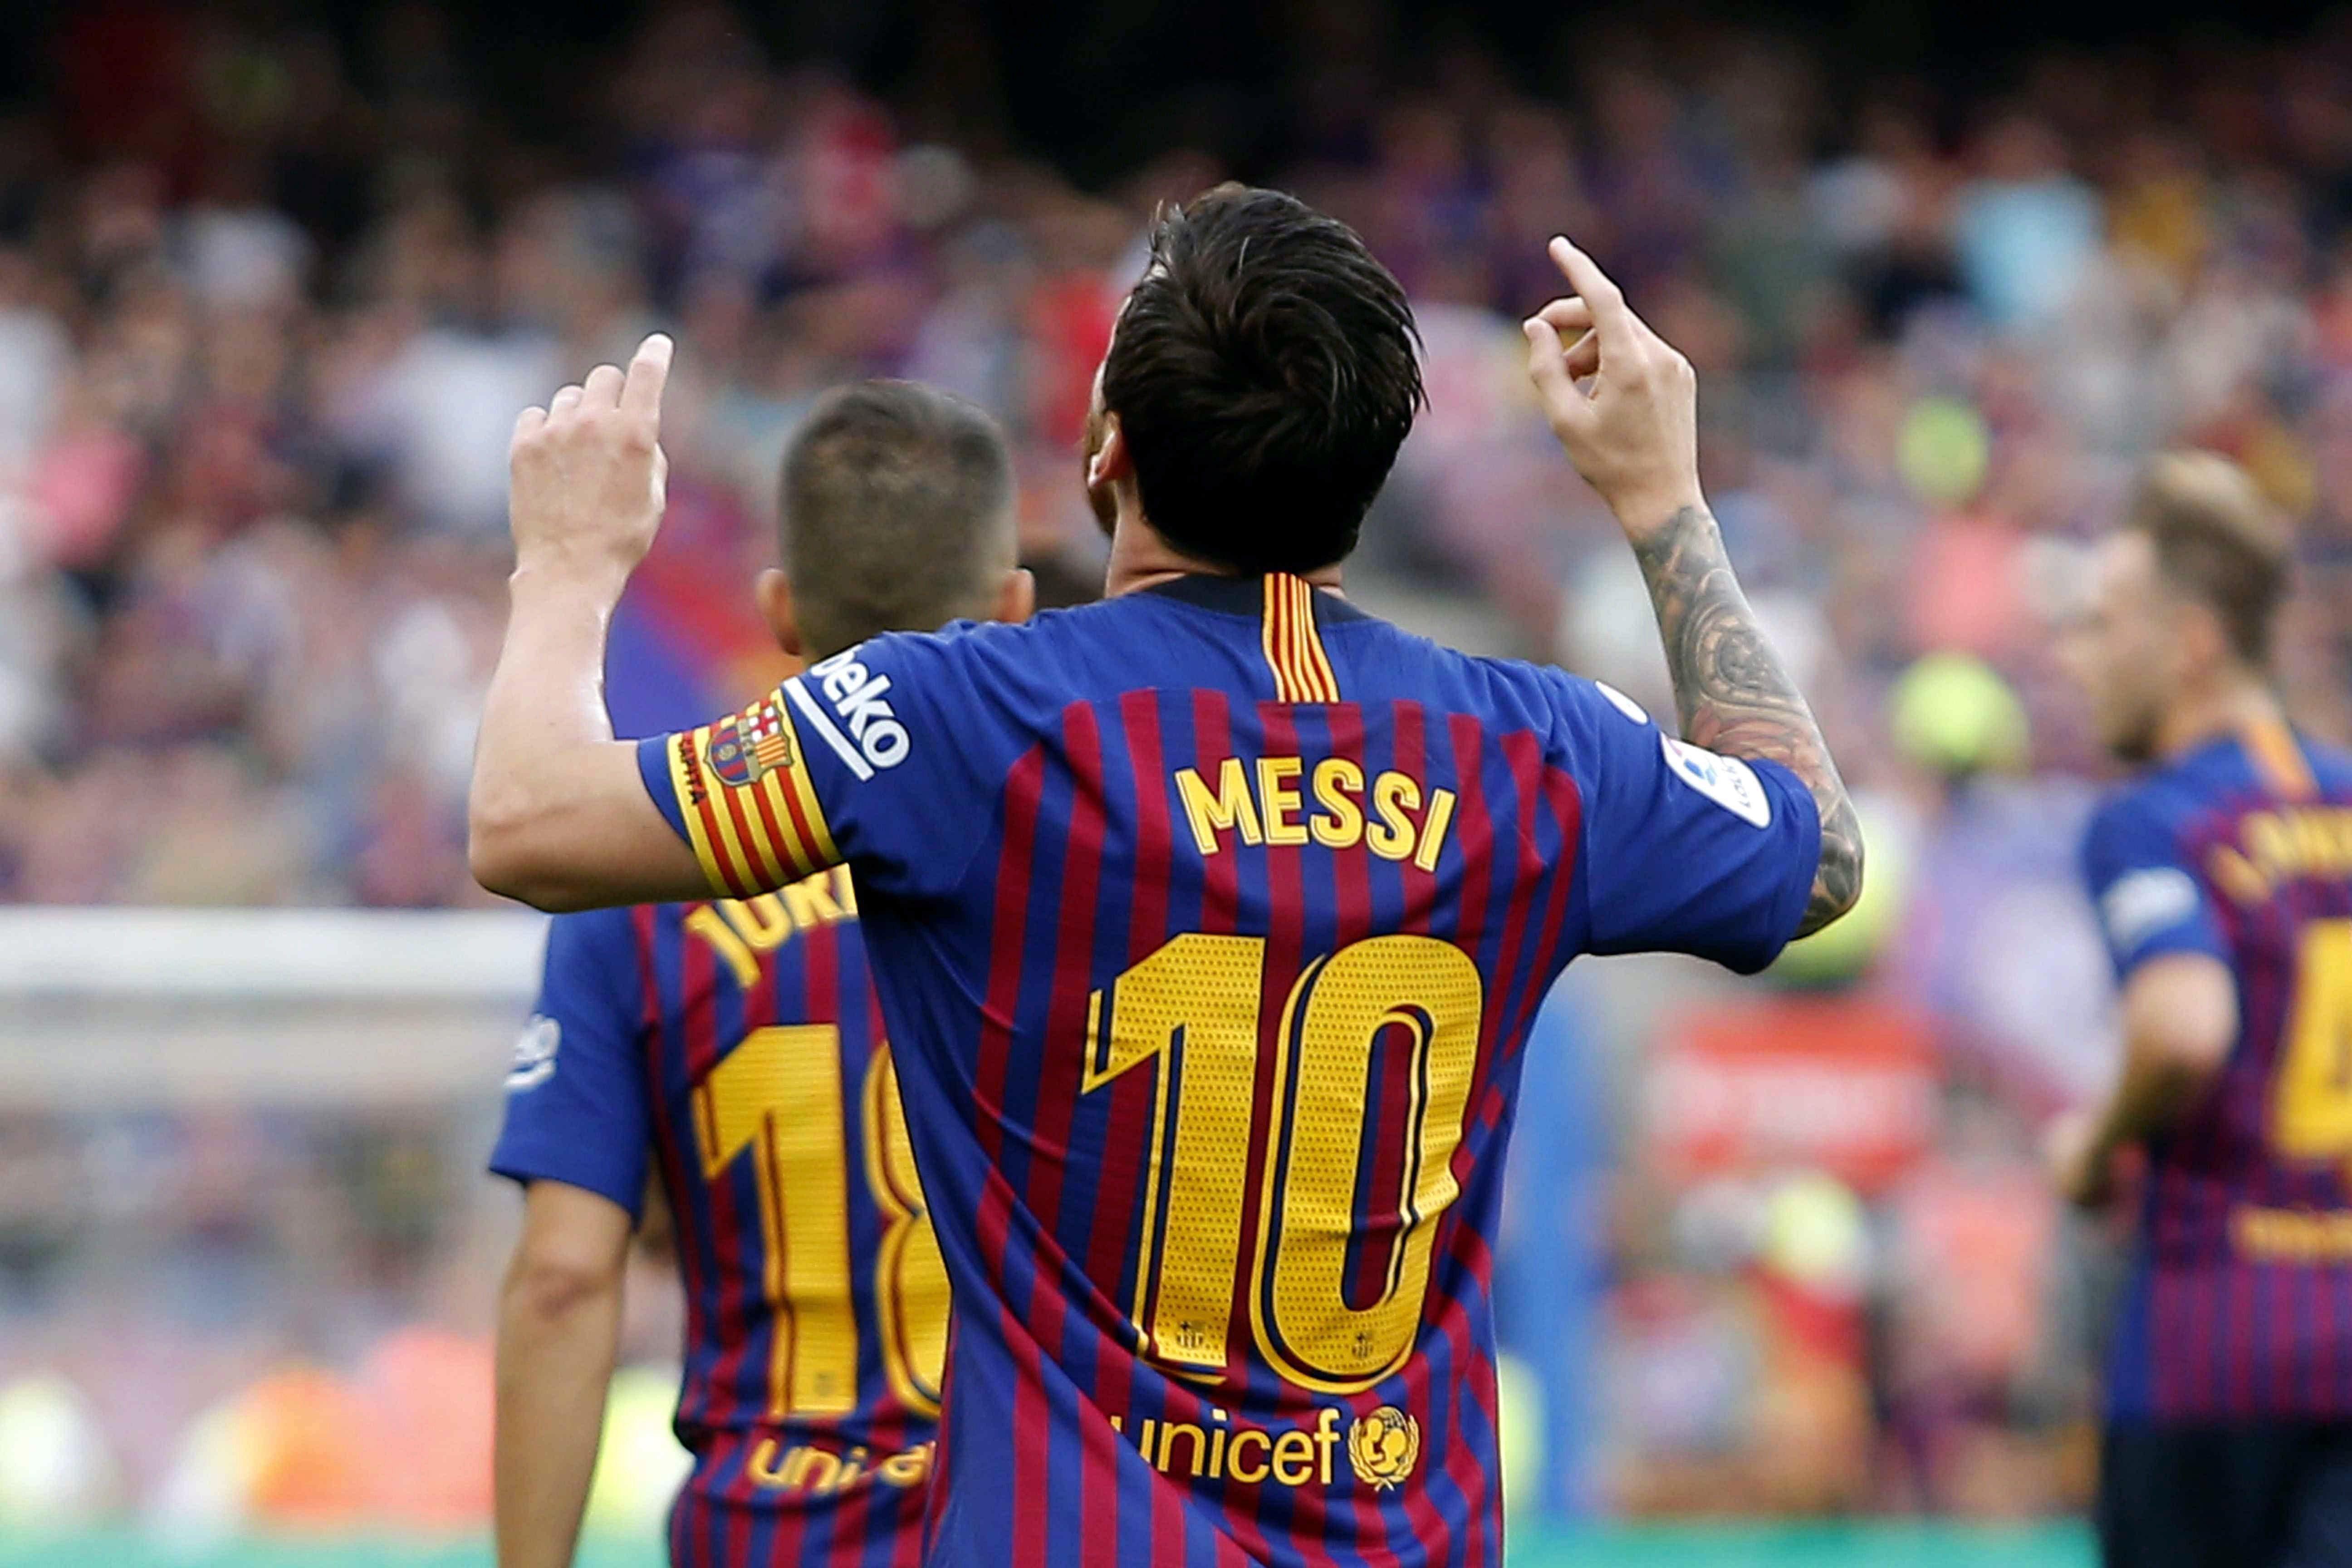 Messi celebració gol Barça Osca   EFE (2)